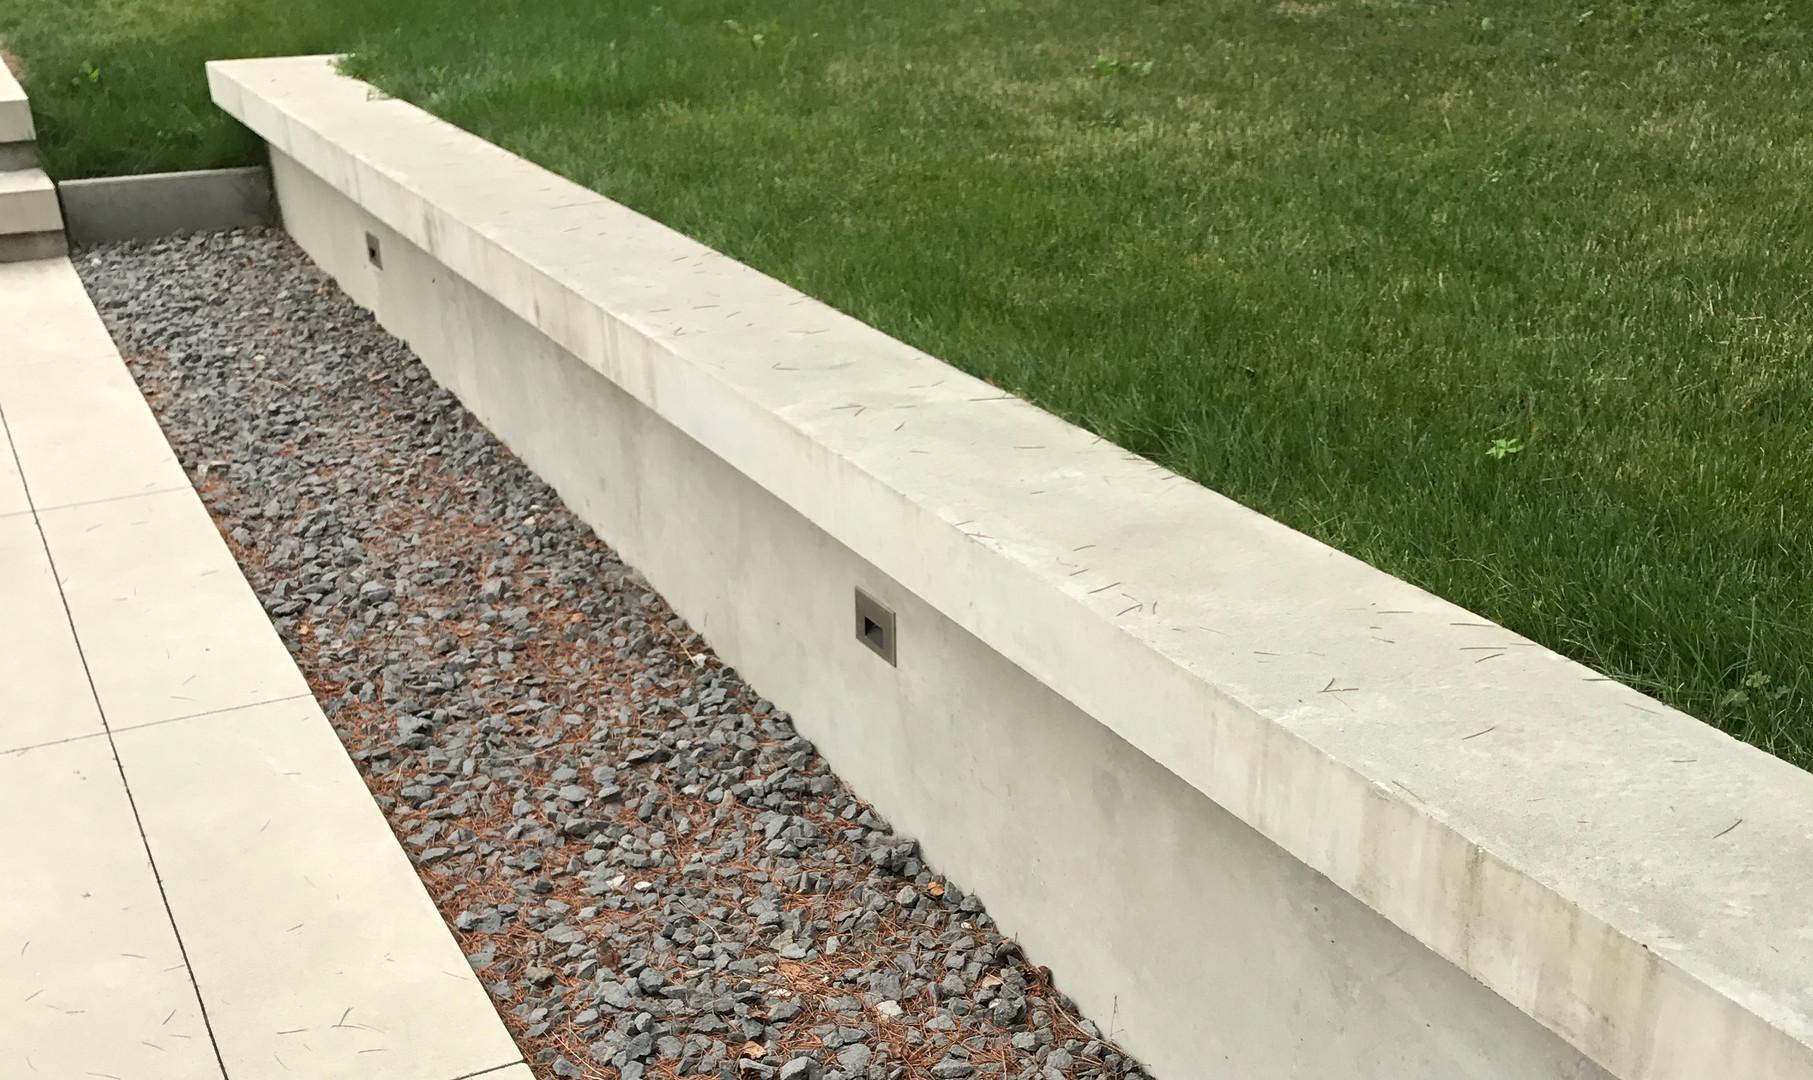 smooth-concrete-retainingwall 04-17999-0